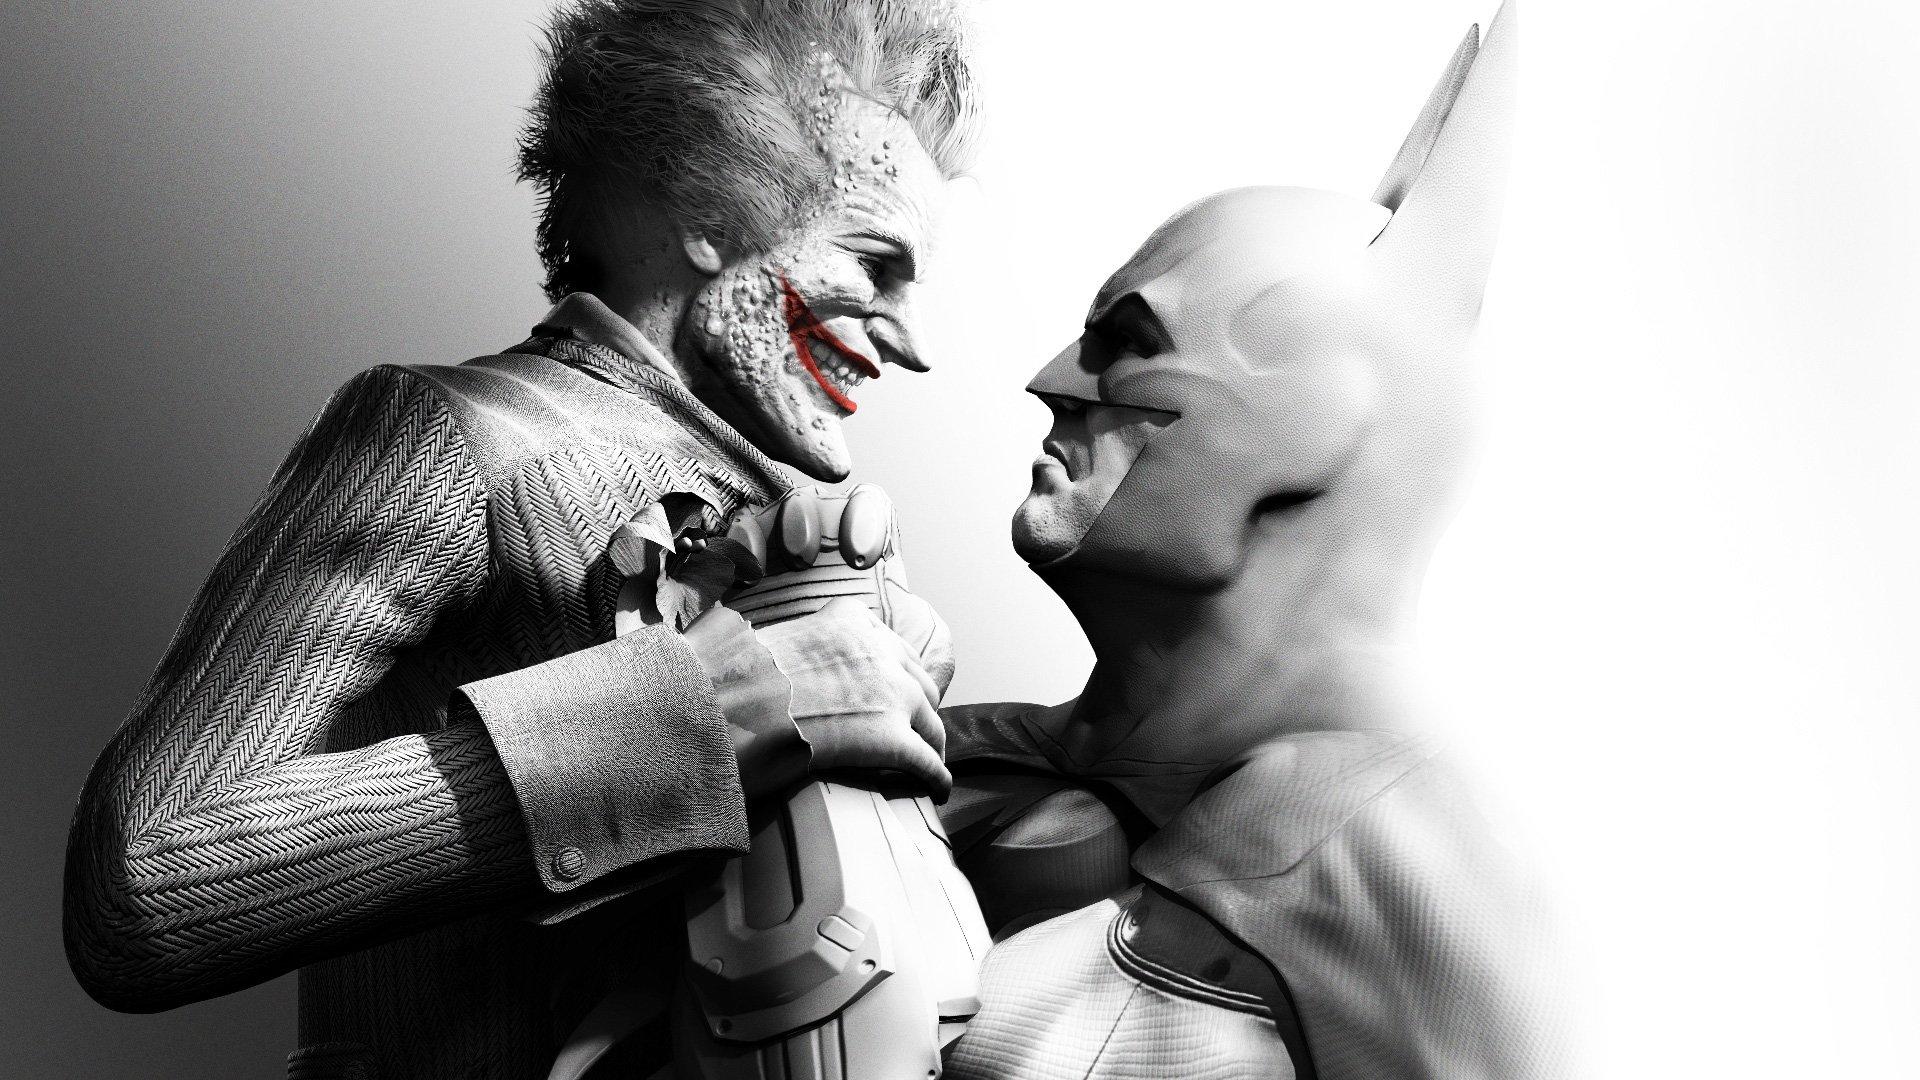 Покупатели Nvidia GeForce получат Batman: Arkham Origins